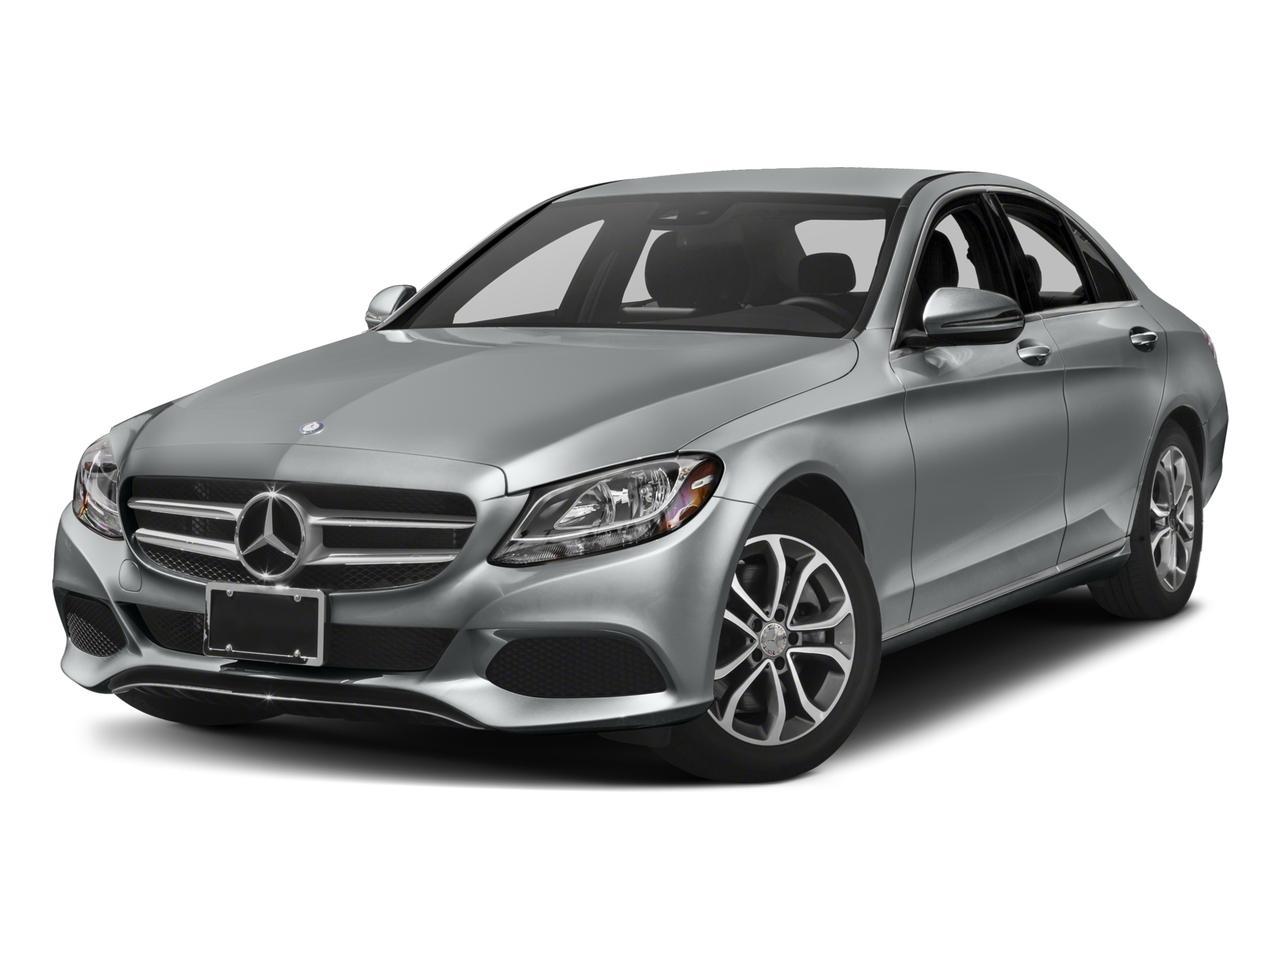 2018 Mercedes-Benz C-Class Vehicle Photo in Smyrna, GA 30080